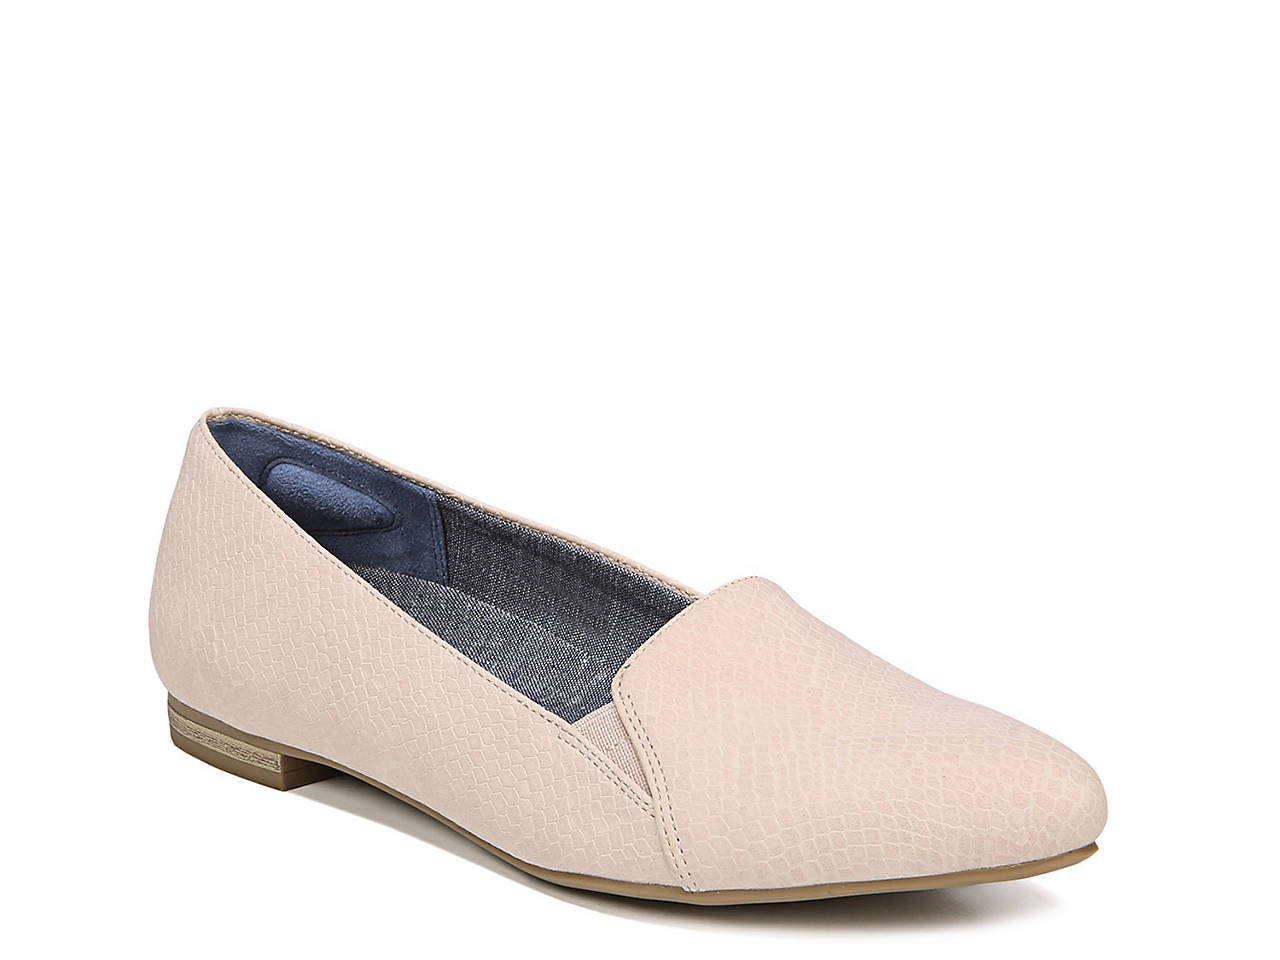 781e150539 Dr. Scholl's Anyways Flat Women's Shoes | DSW